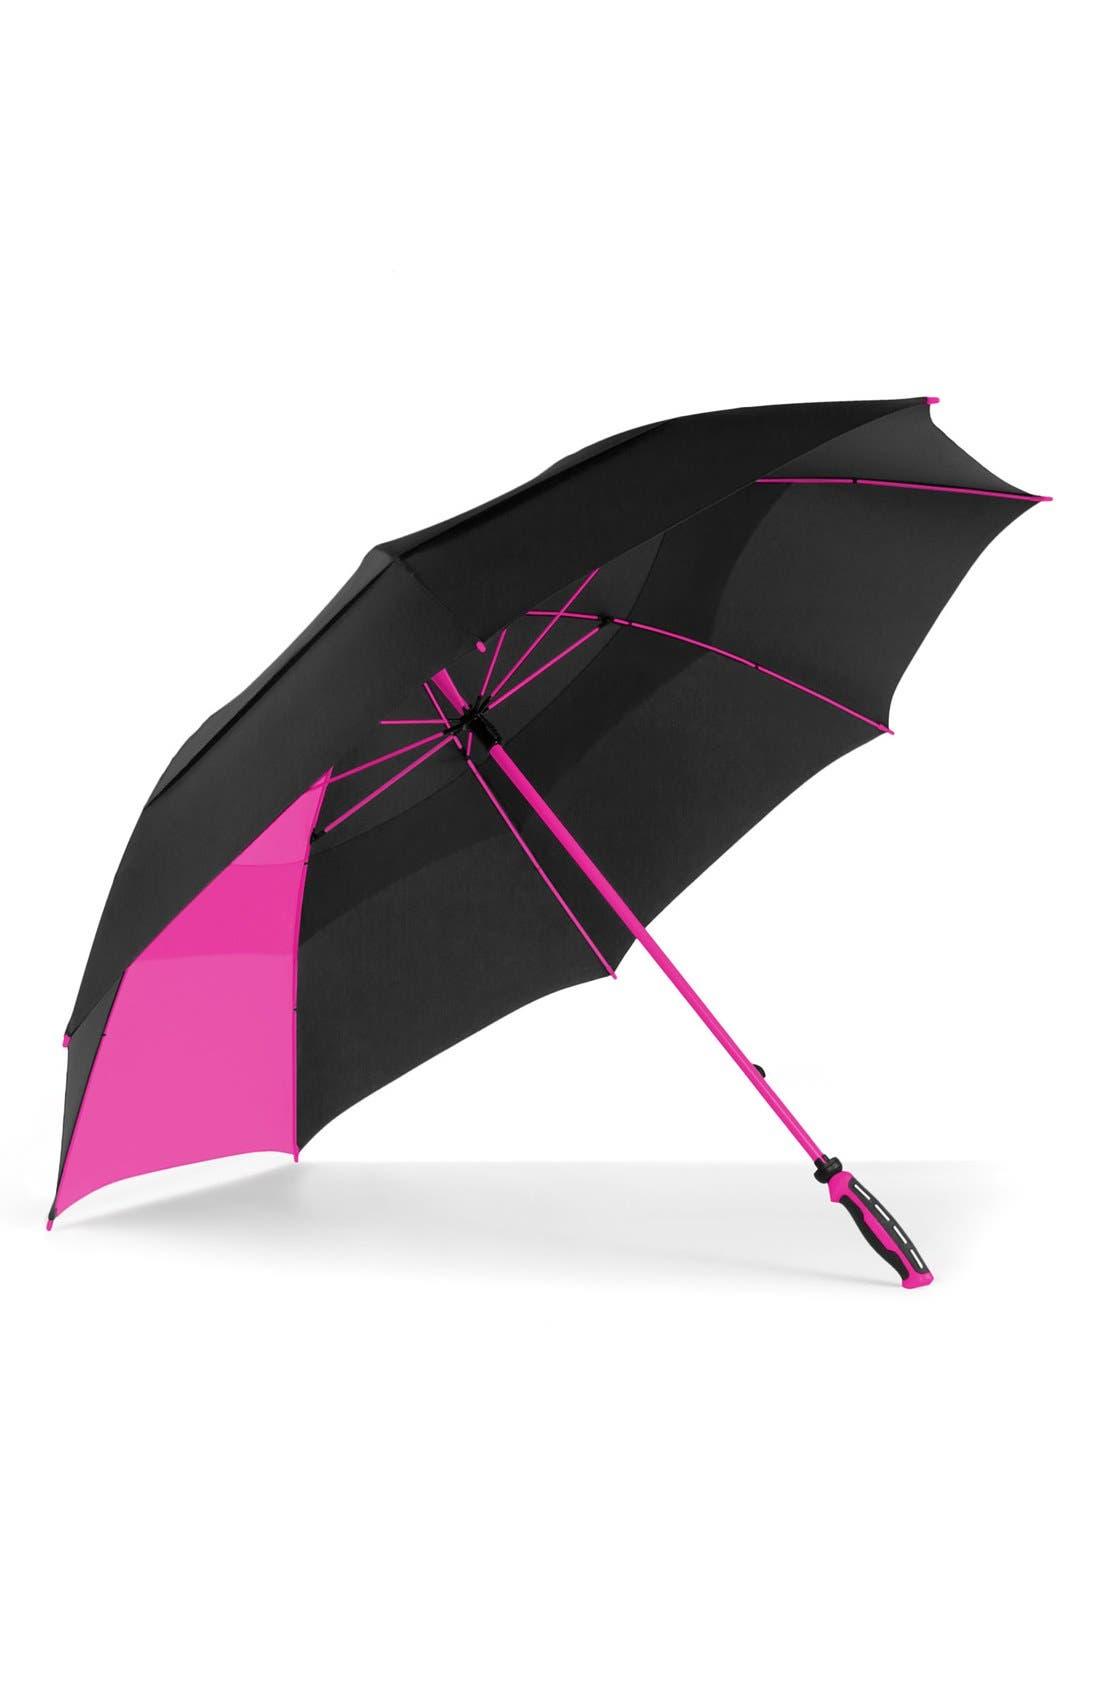 ShedRain 'WindJammer®' Golf Umbrella